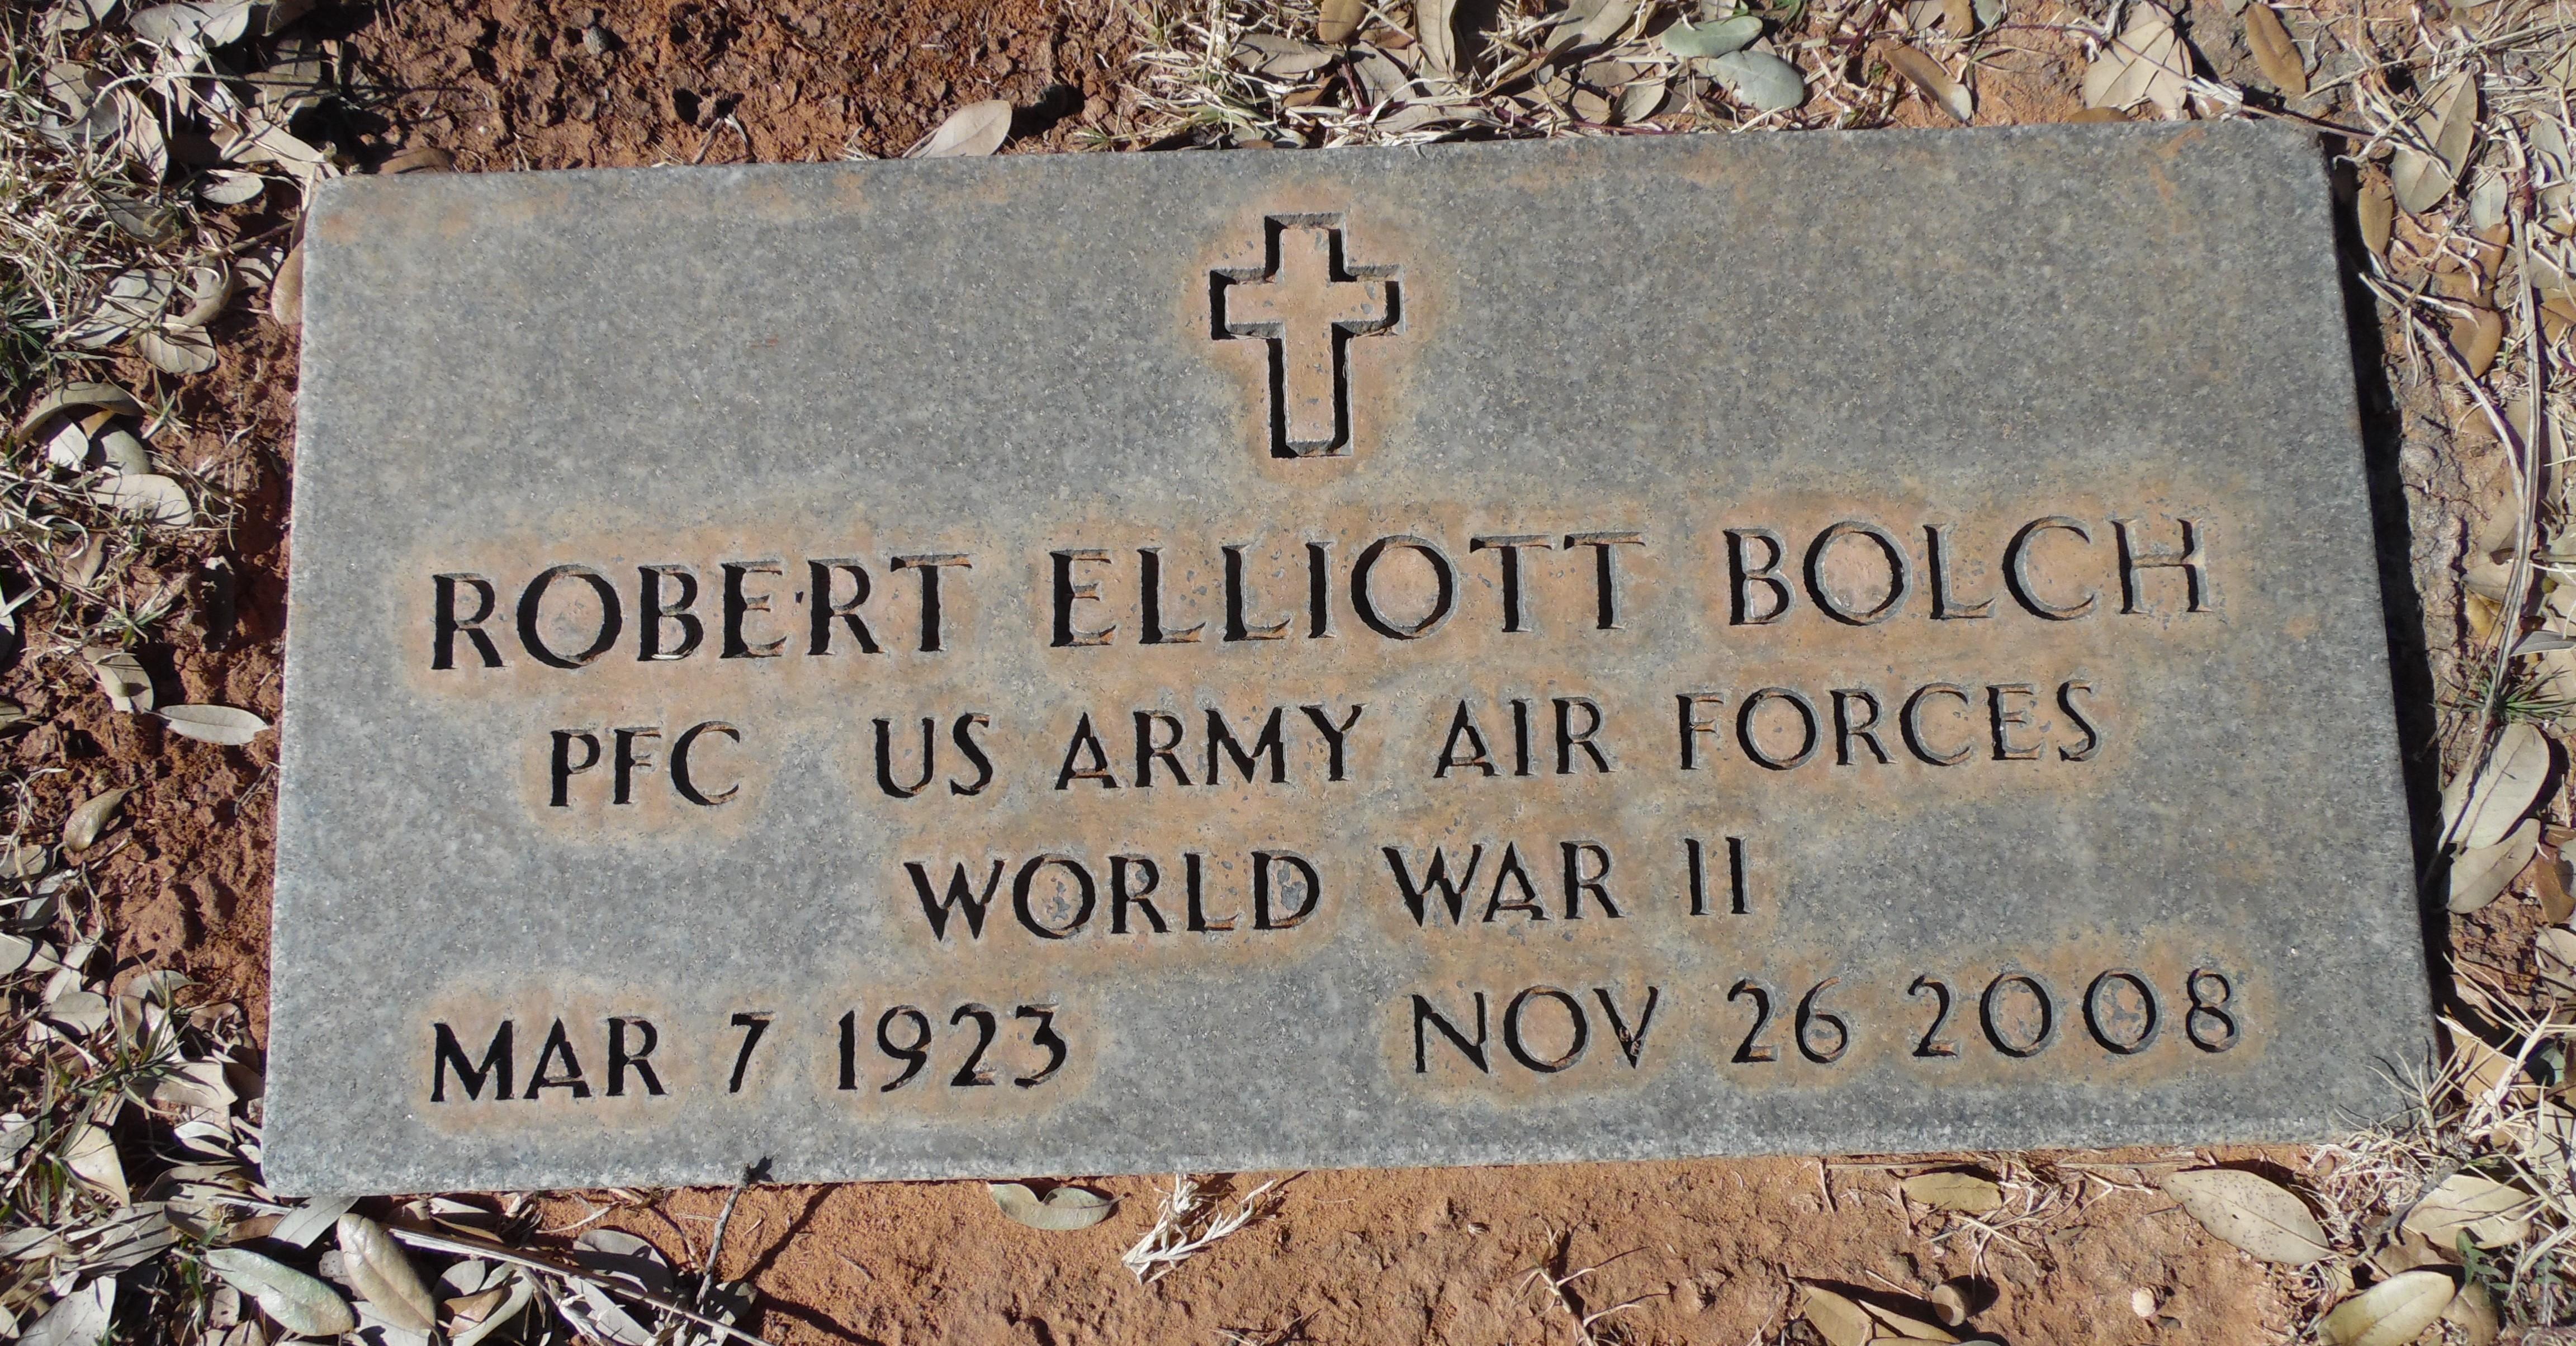 Robert Elliott Bolch